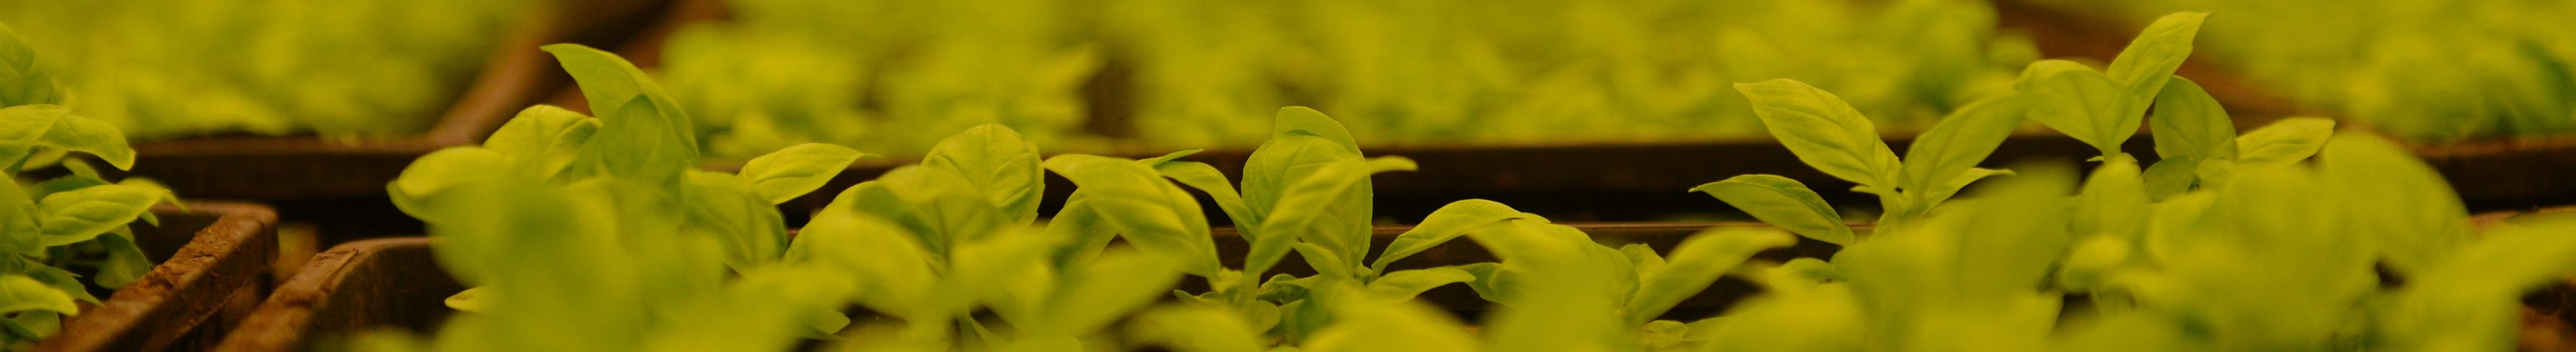 Agriculture-urbaine-Milwaukee-©-Gembloux-Agro-Bio-Tech-7